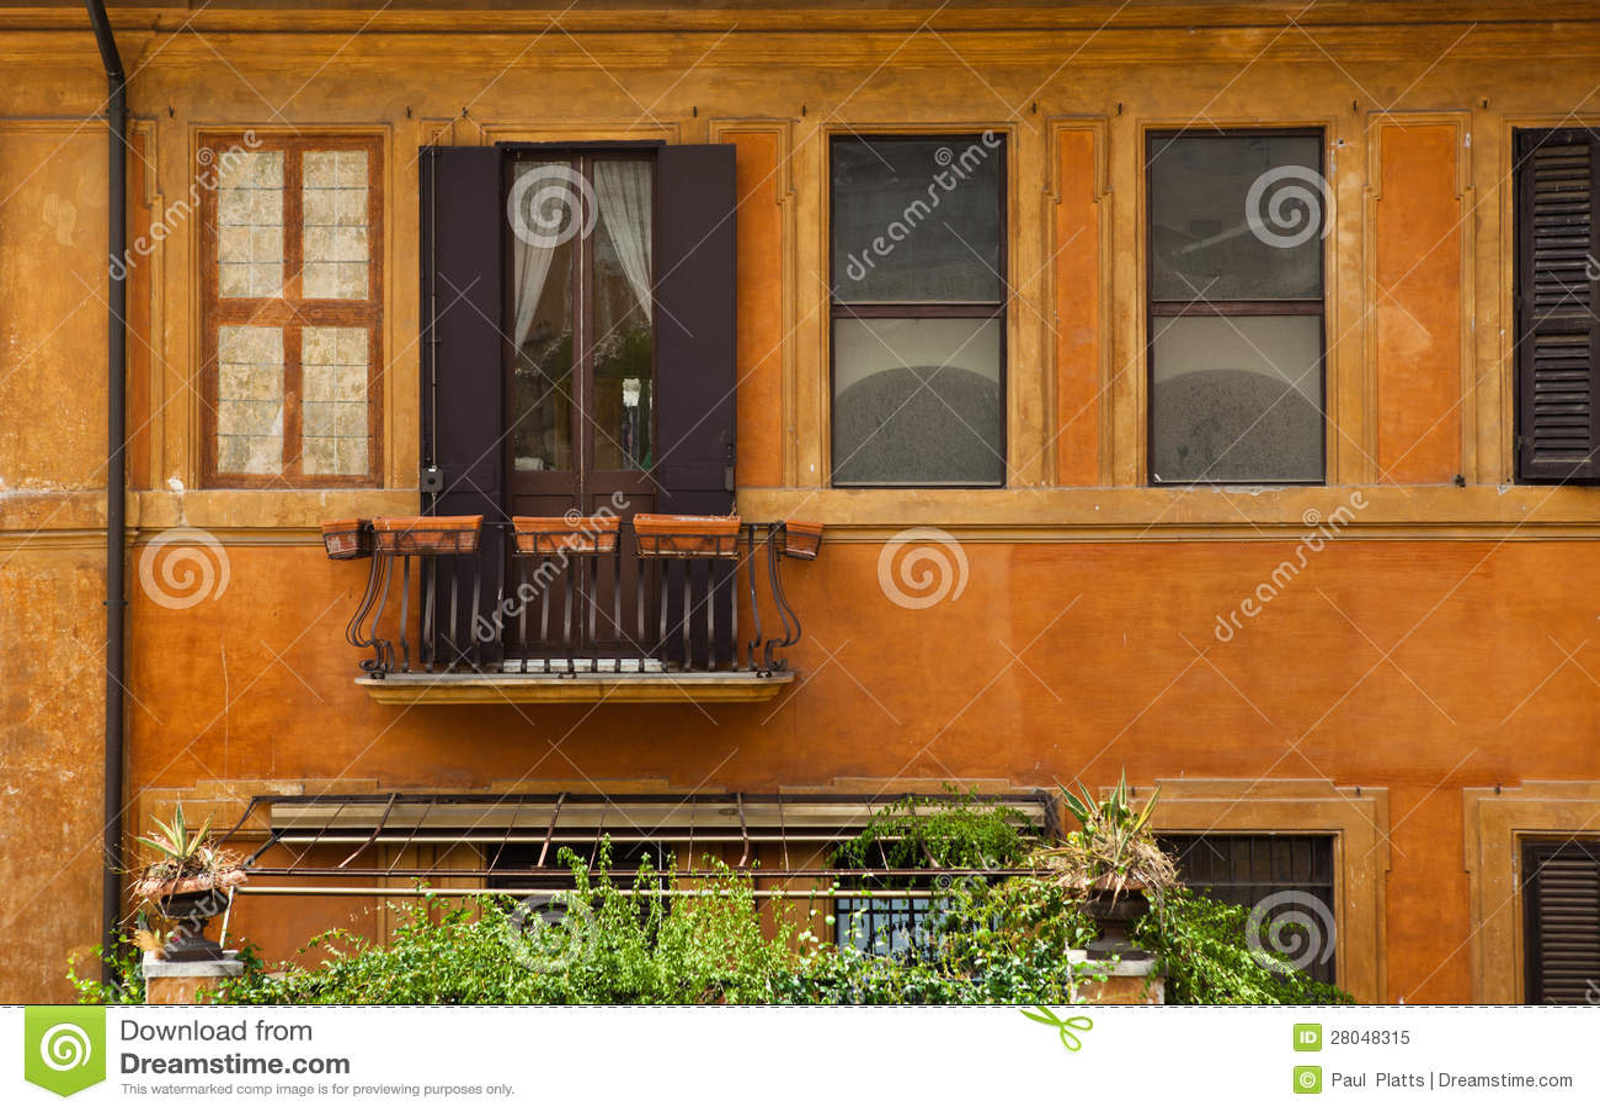 Yellow Ochre House Royalty Free Stock Photo - Image: 28048315